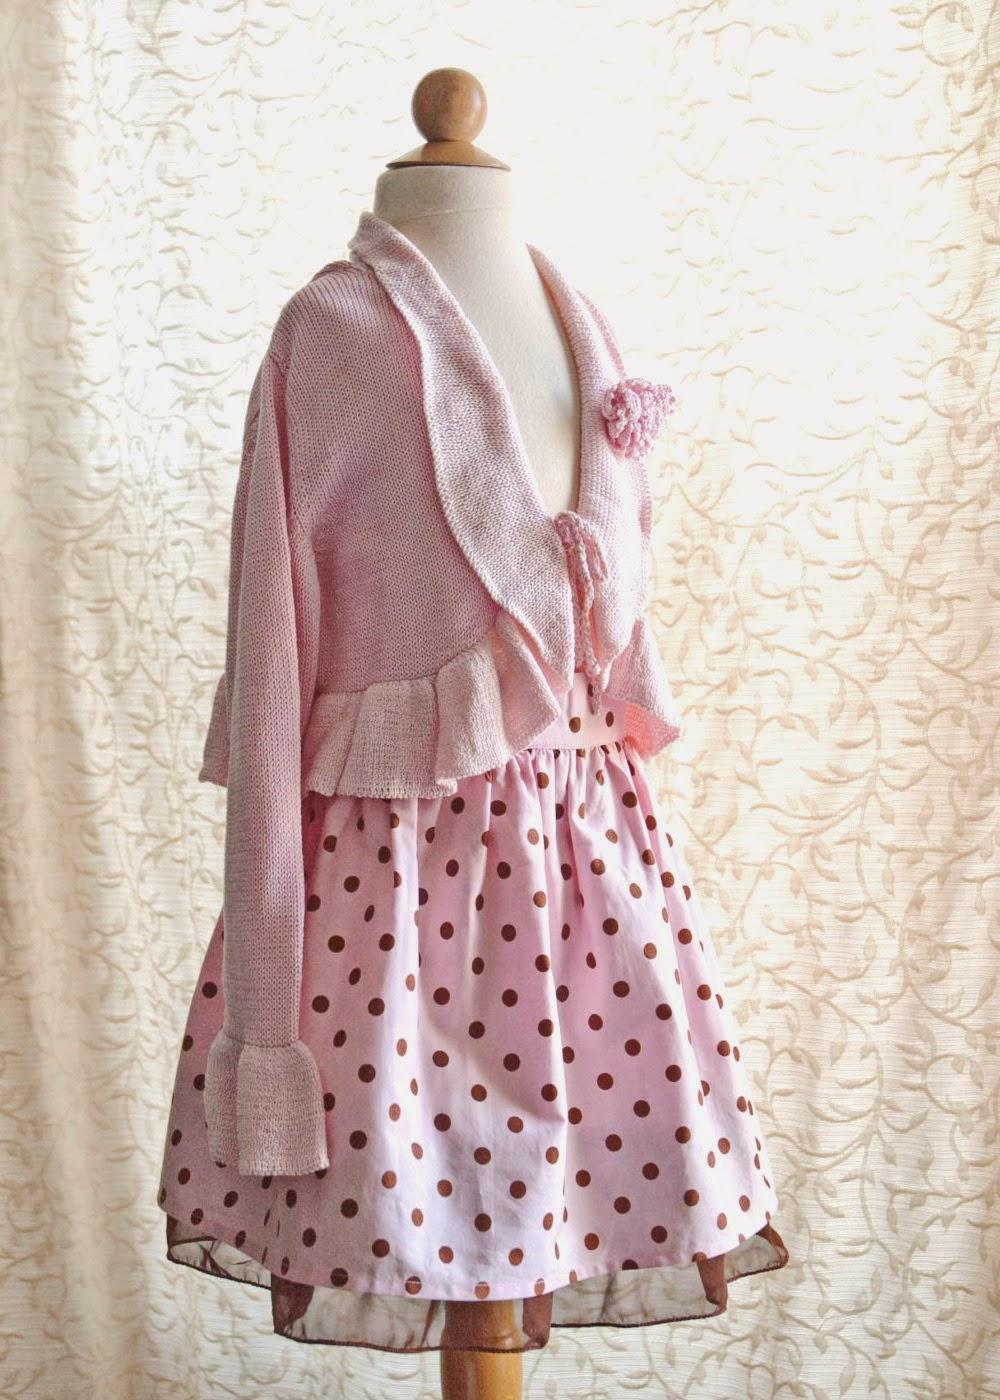 https://www.etsy.com/listing/184062515/cotton-knit-pink-ruffled-bolero-polkadot?ref=shop_home_active_18